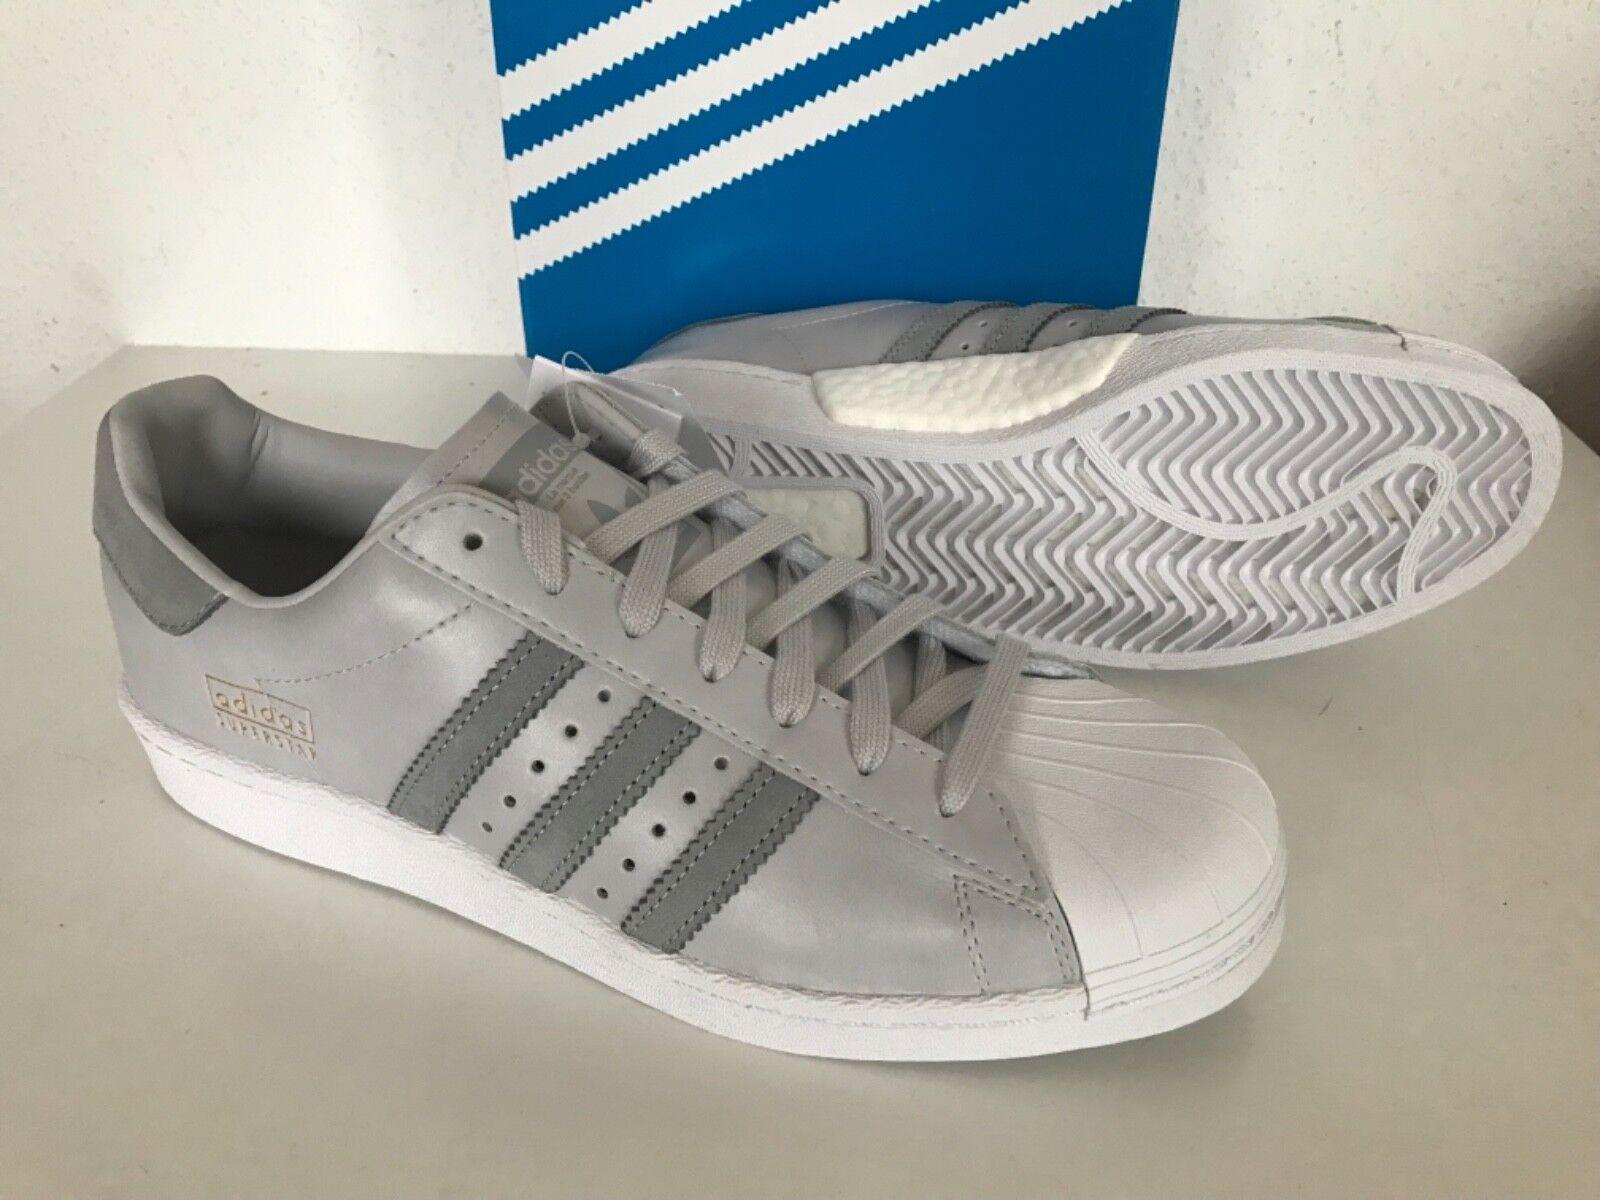 NEW Adidas Originals Superstar Boost grey Mens shoes SIZE US 10 BZ0206